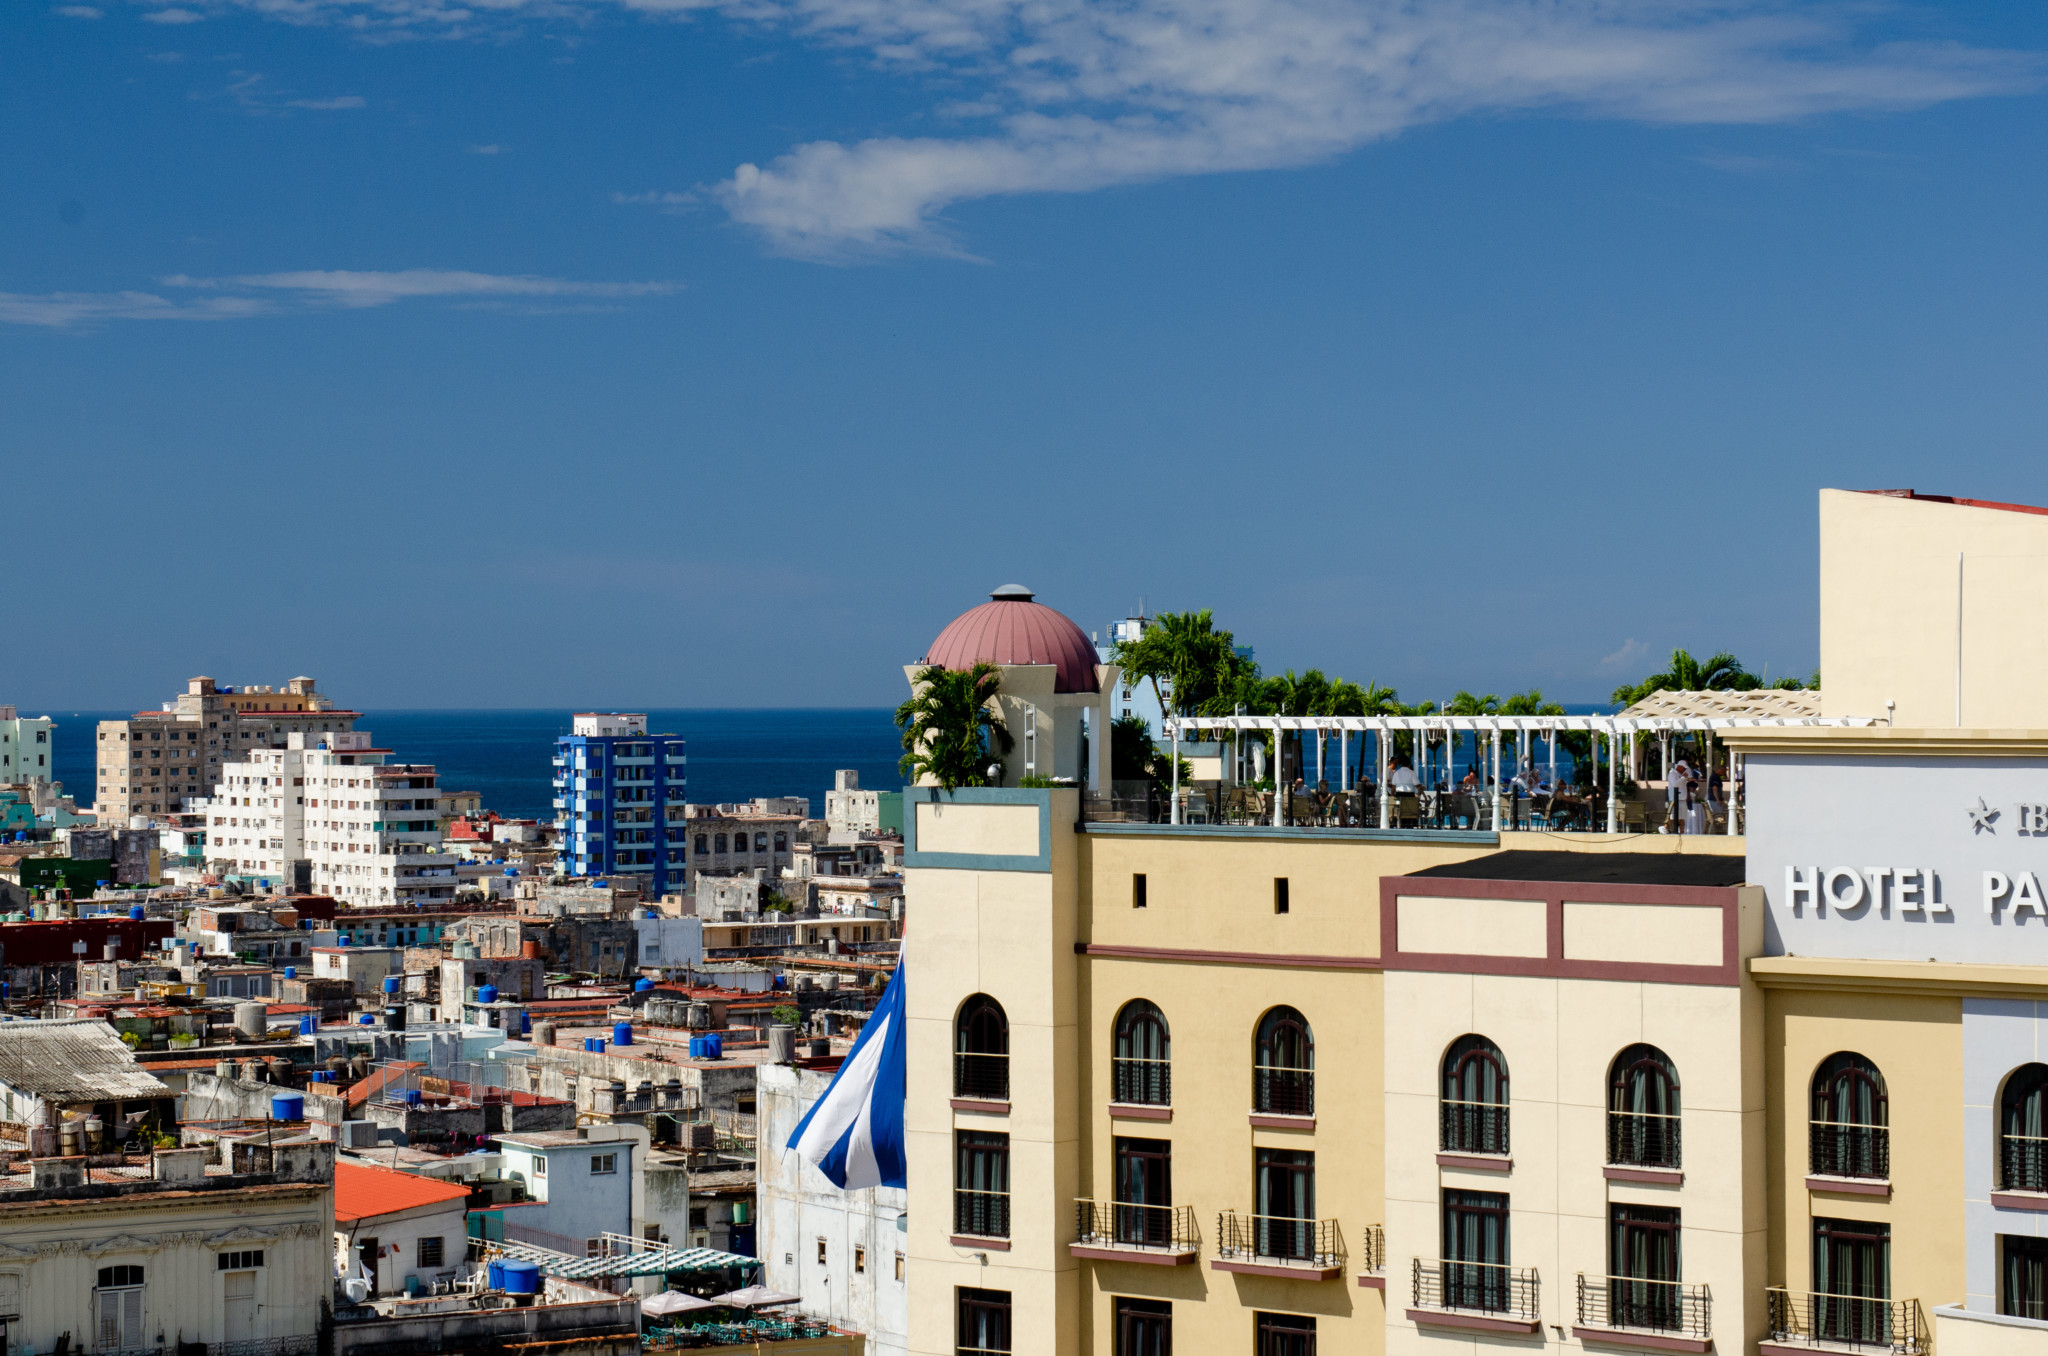 Ausblick über Havanna in Kuba